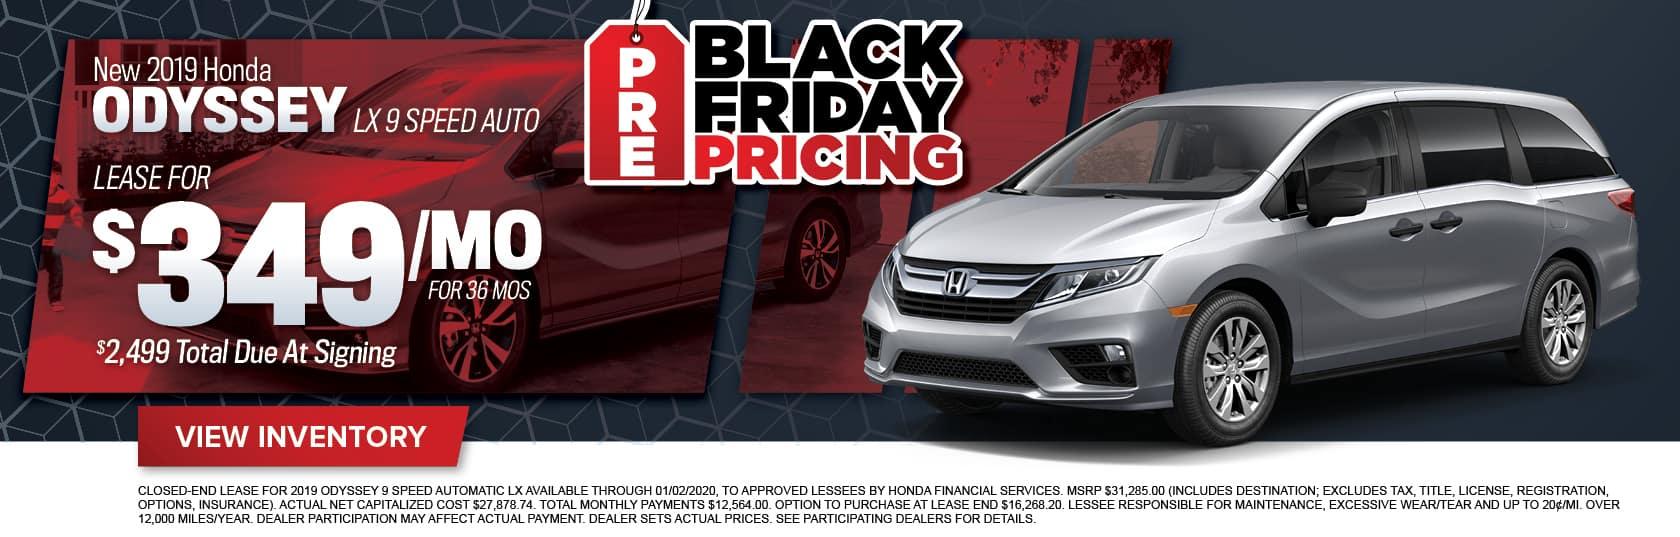 New Honda Odyssey for Sale in Midlothian, VA